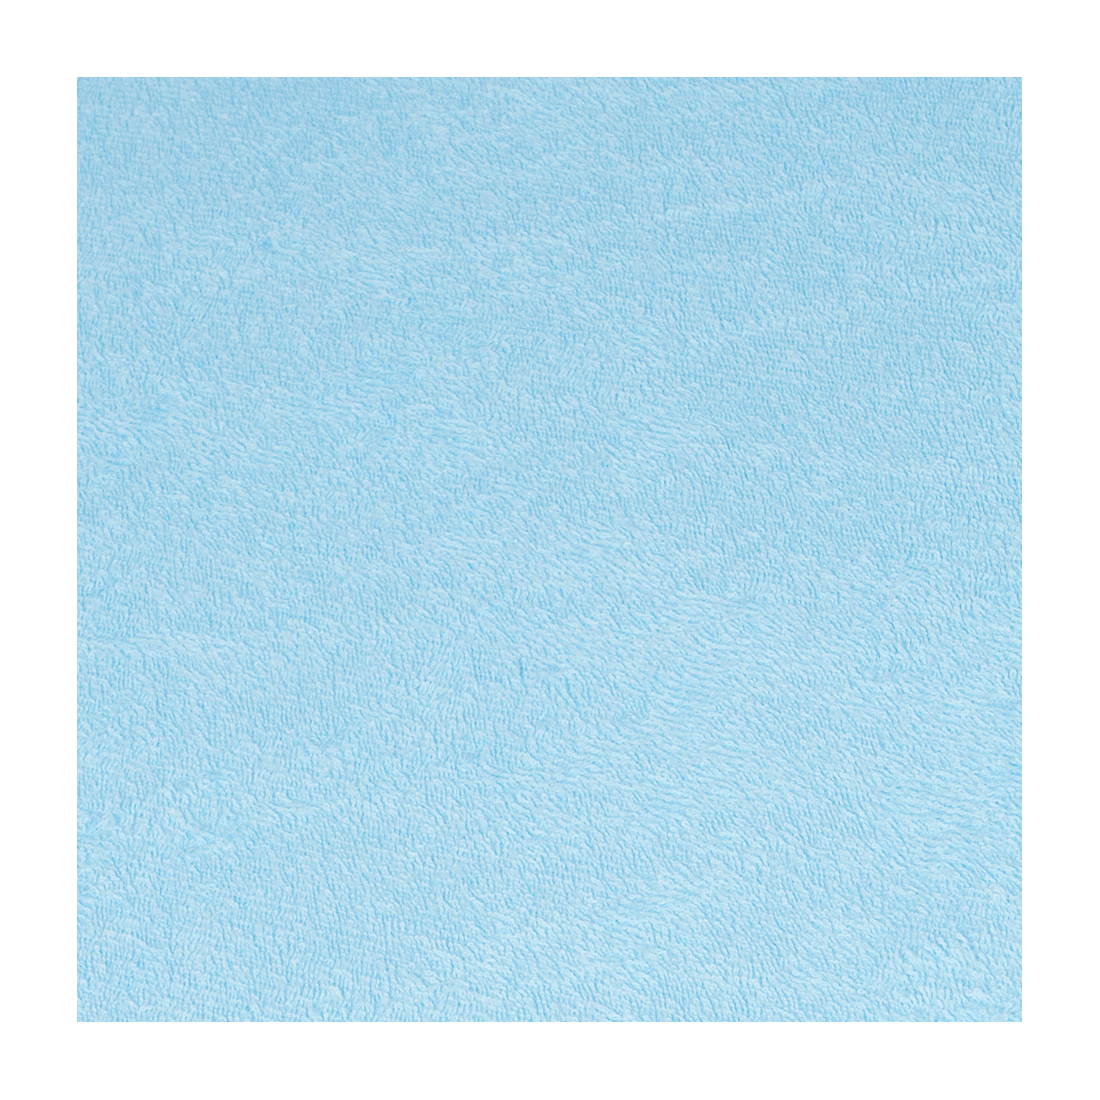 NP froté Klín 35x26 m, modrá